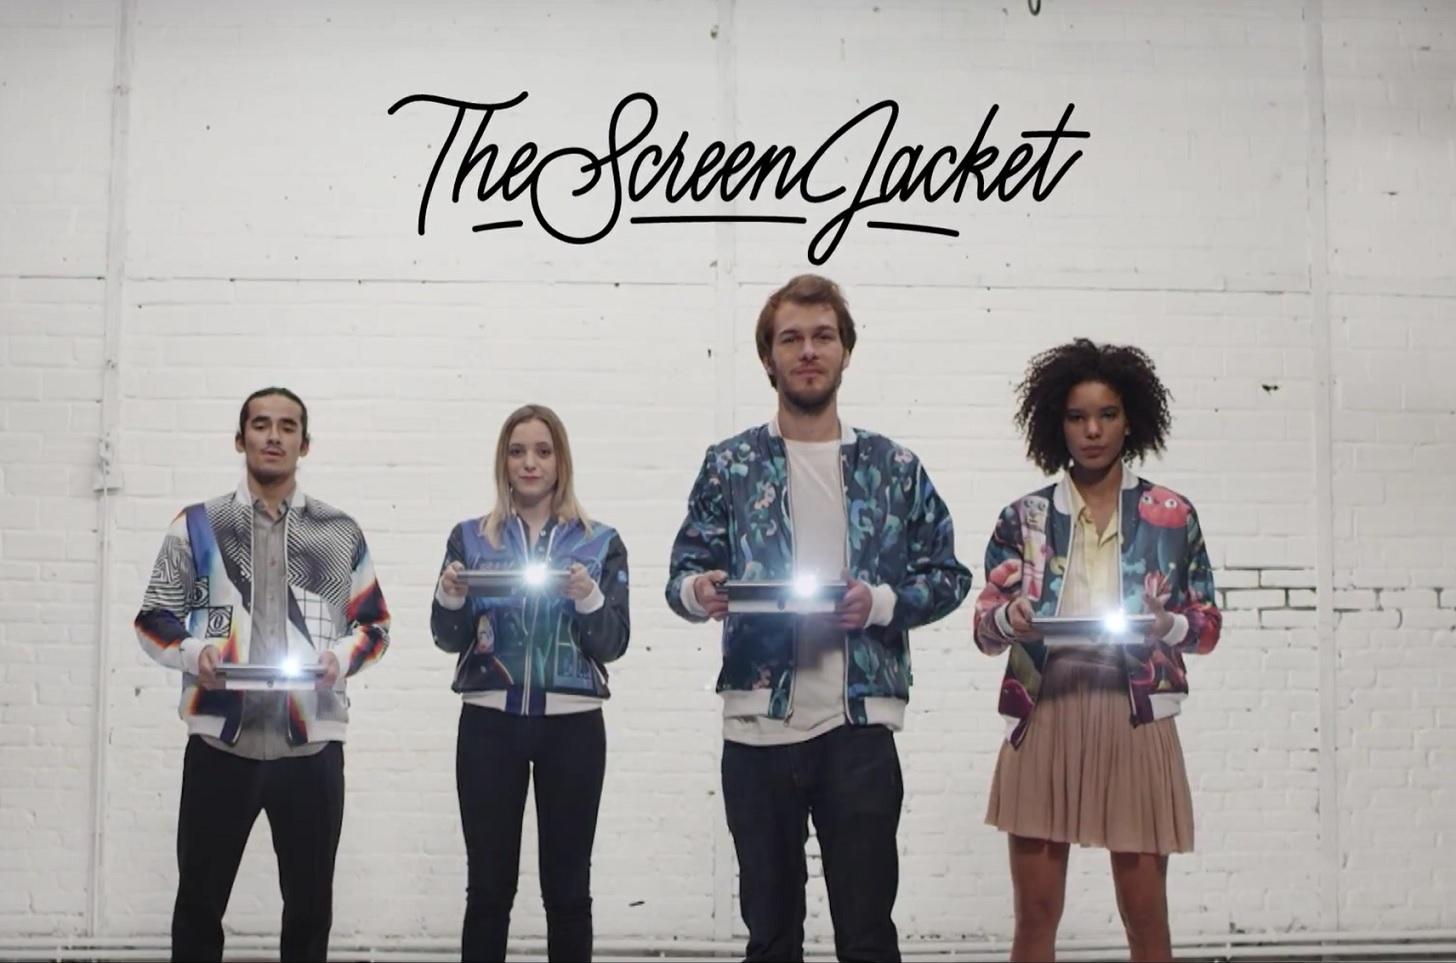 Screen Jacket